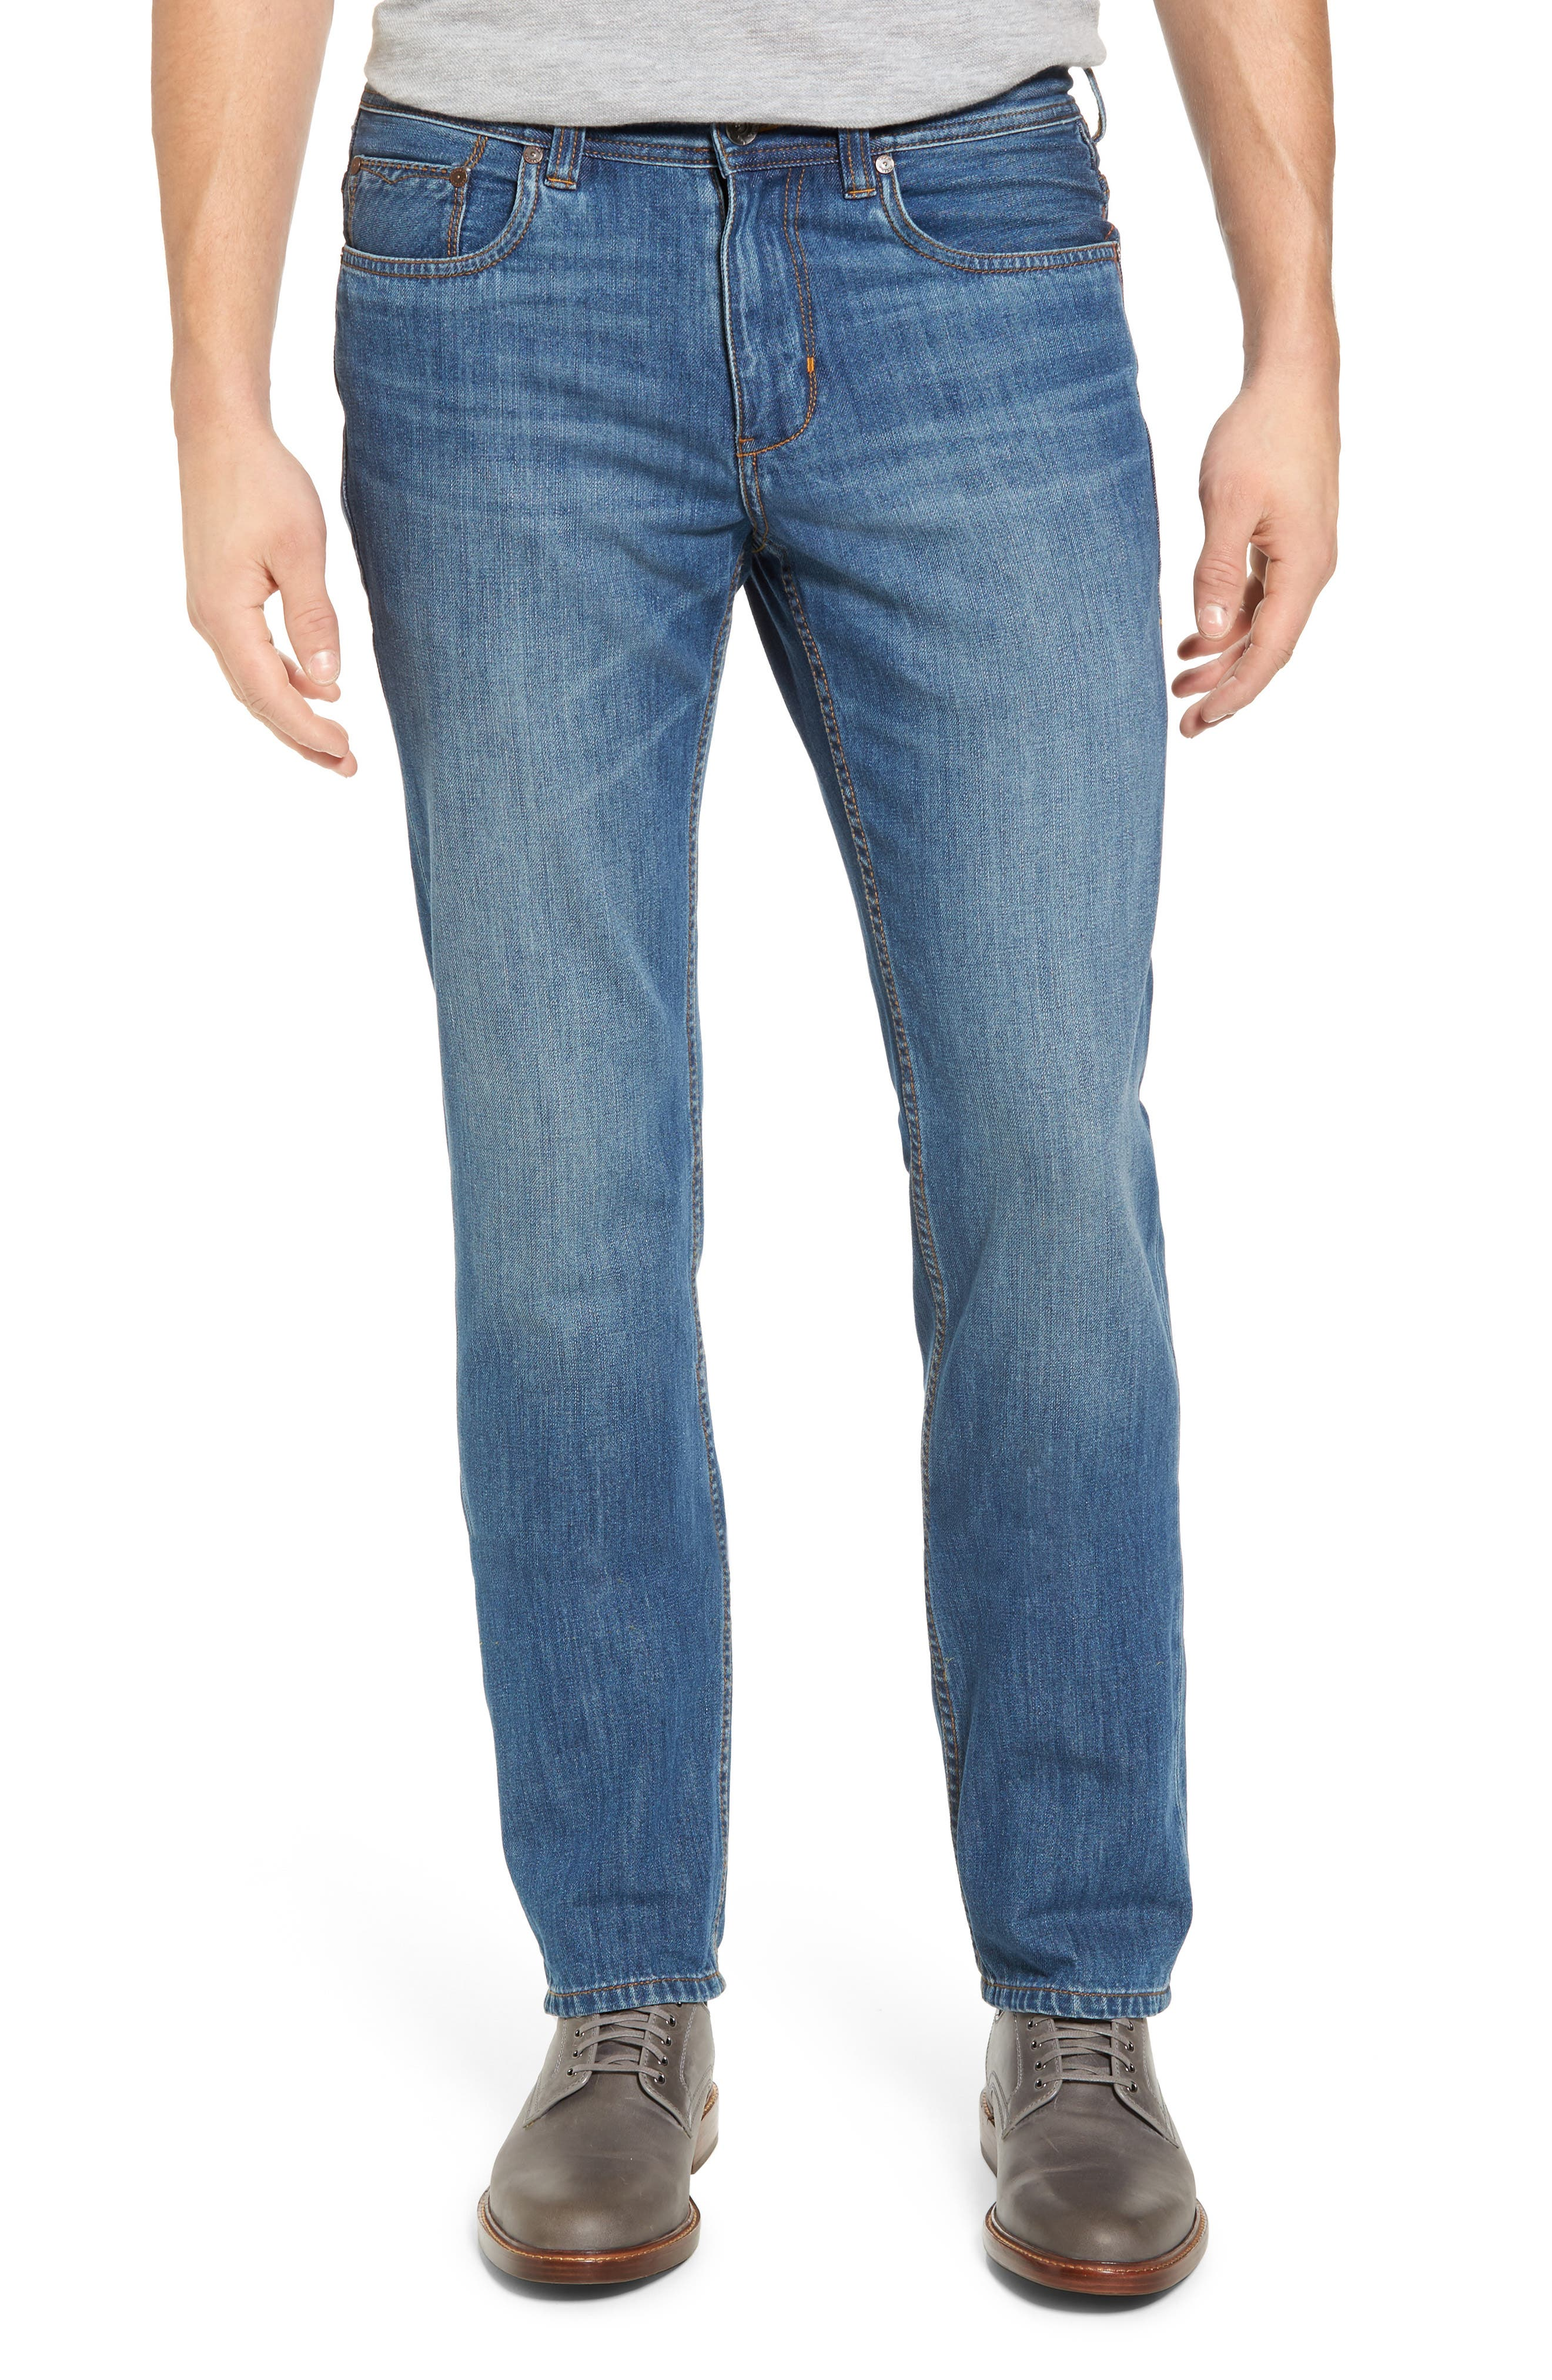 Bardabos Straight Leg Jeans,                             Main thumbnail 1, color,